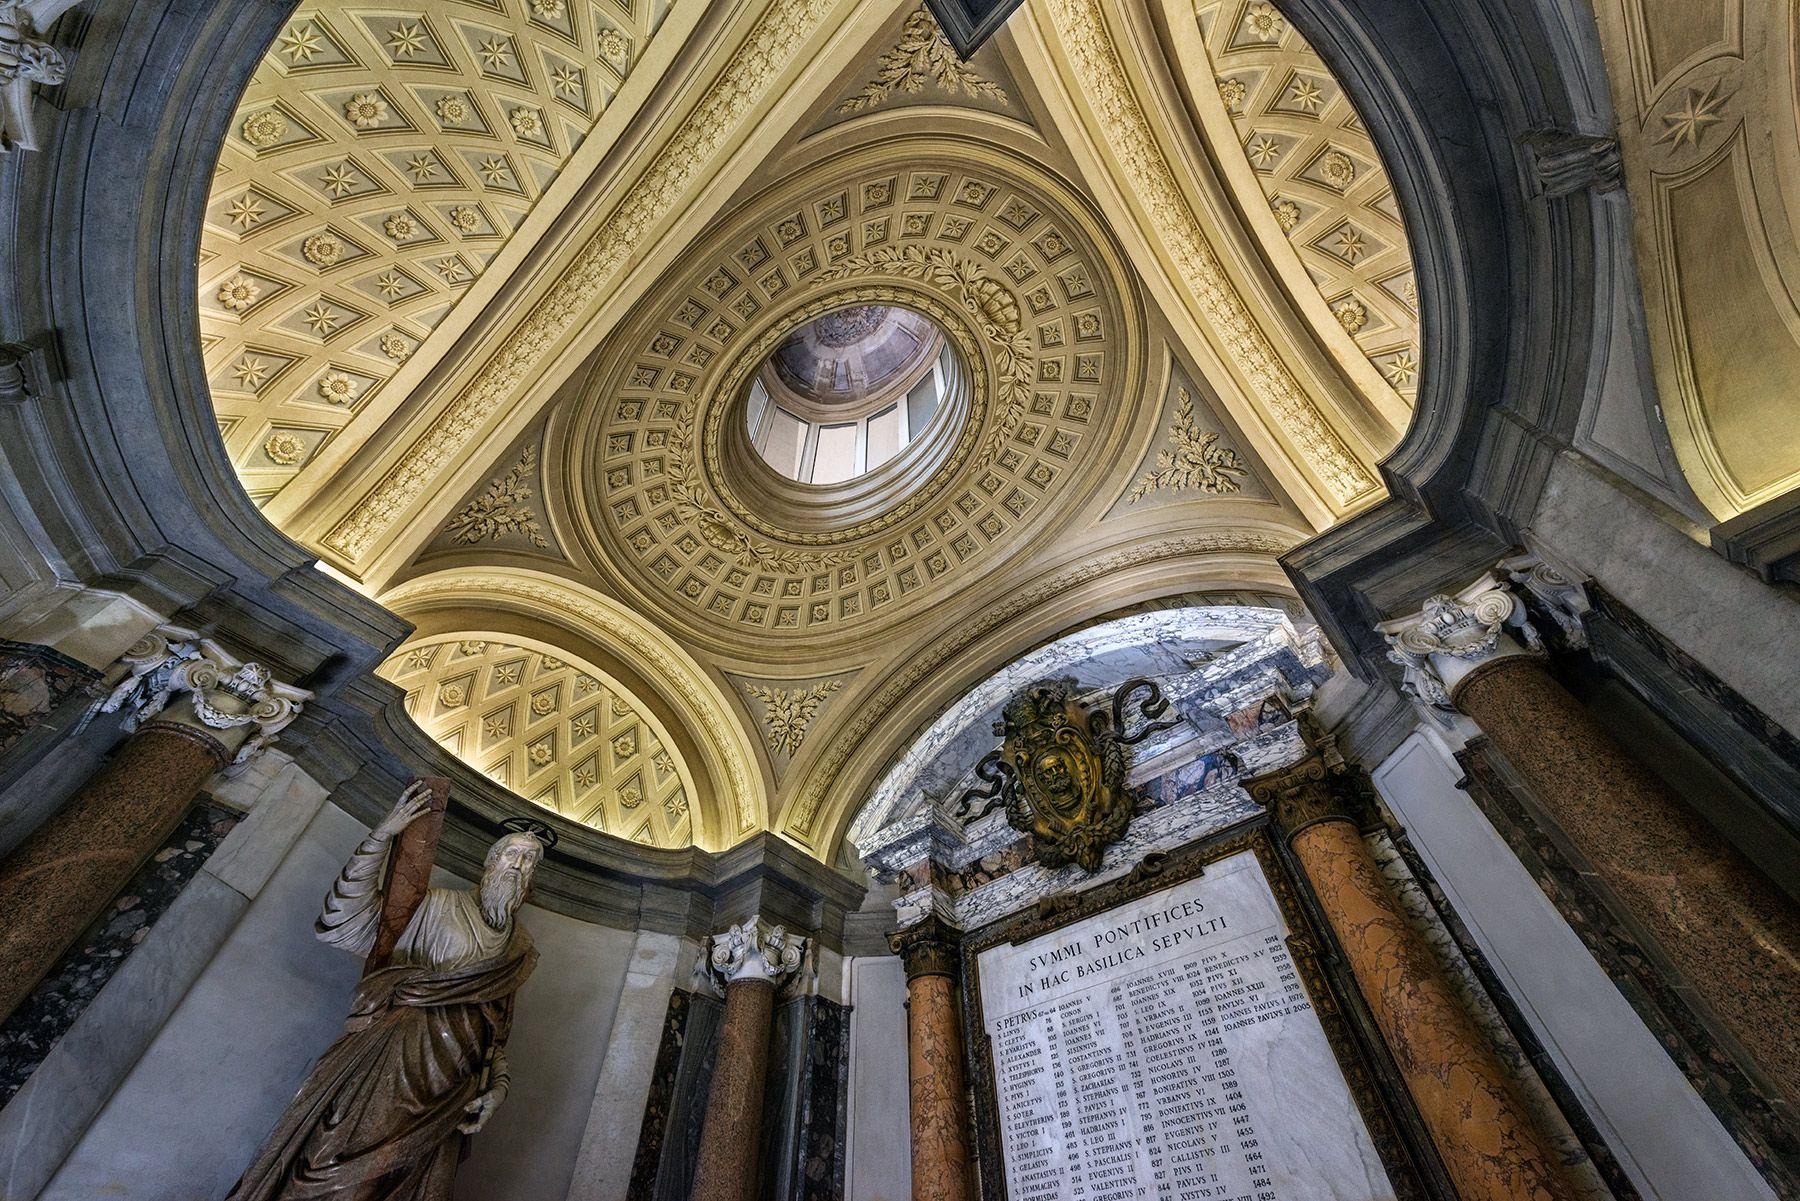 Tumbas papales en la antigua basílica de San Pedro (Roma)